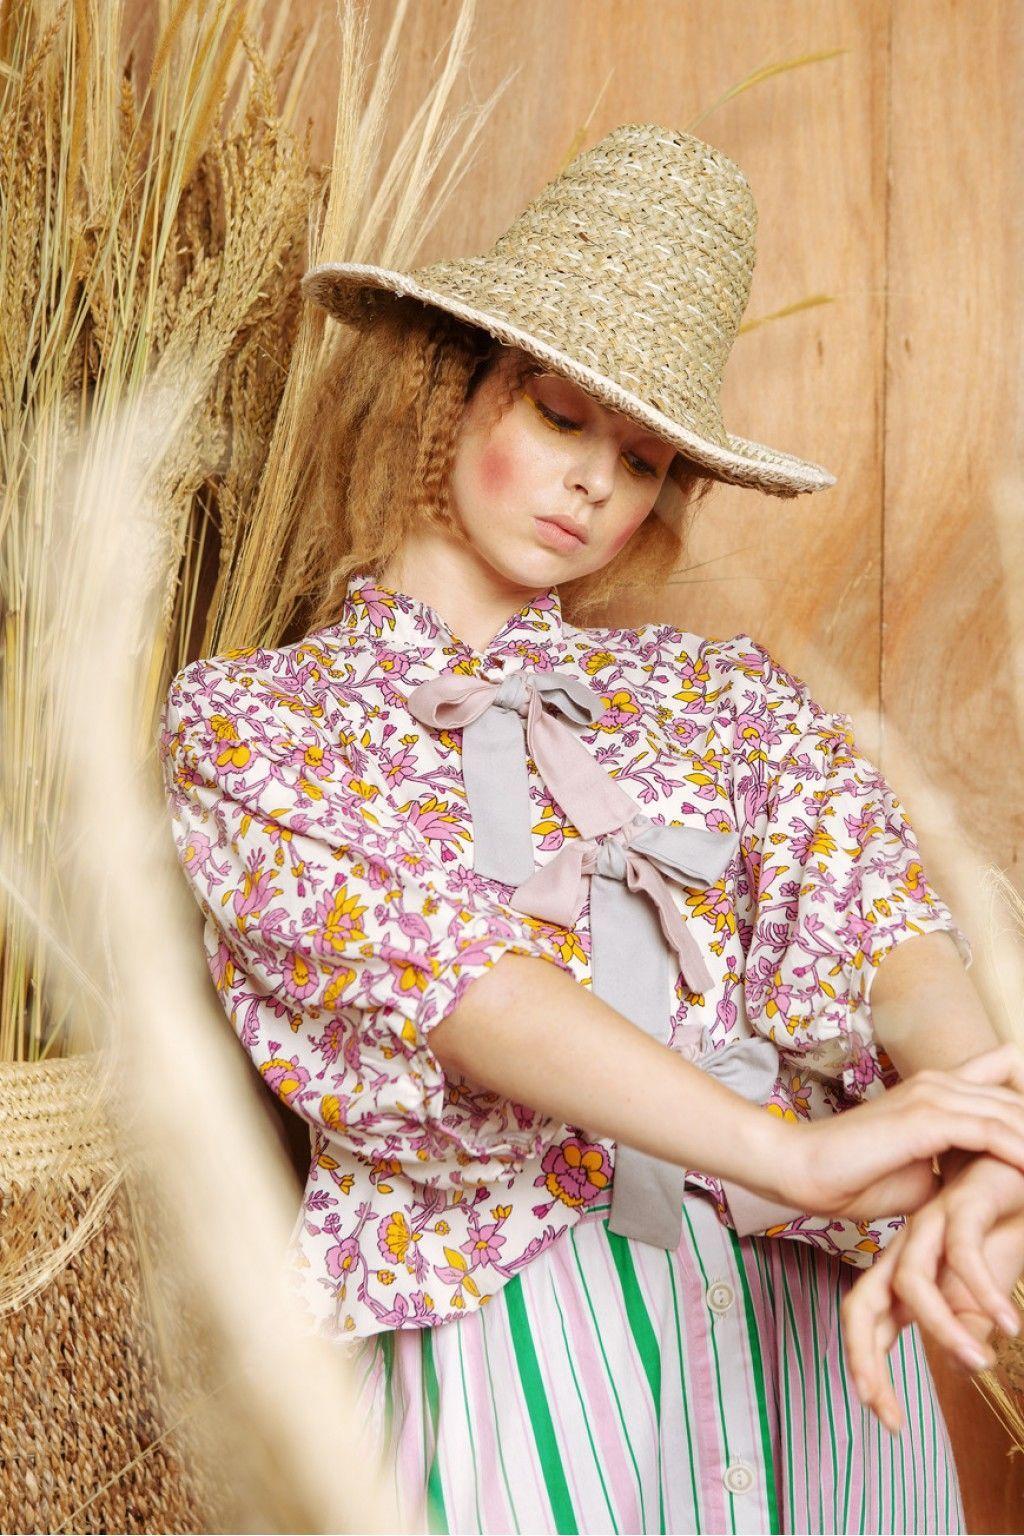 #PopbelaOOTD: Saatnya Tampil Makin Cantik dengan Motif Floral